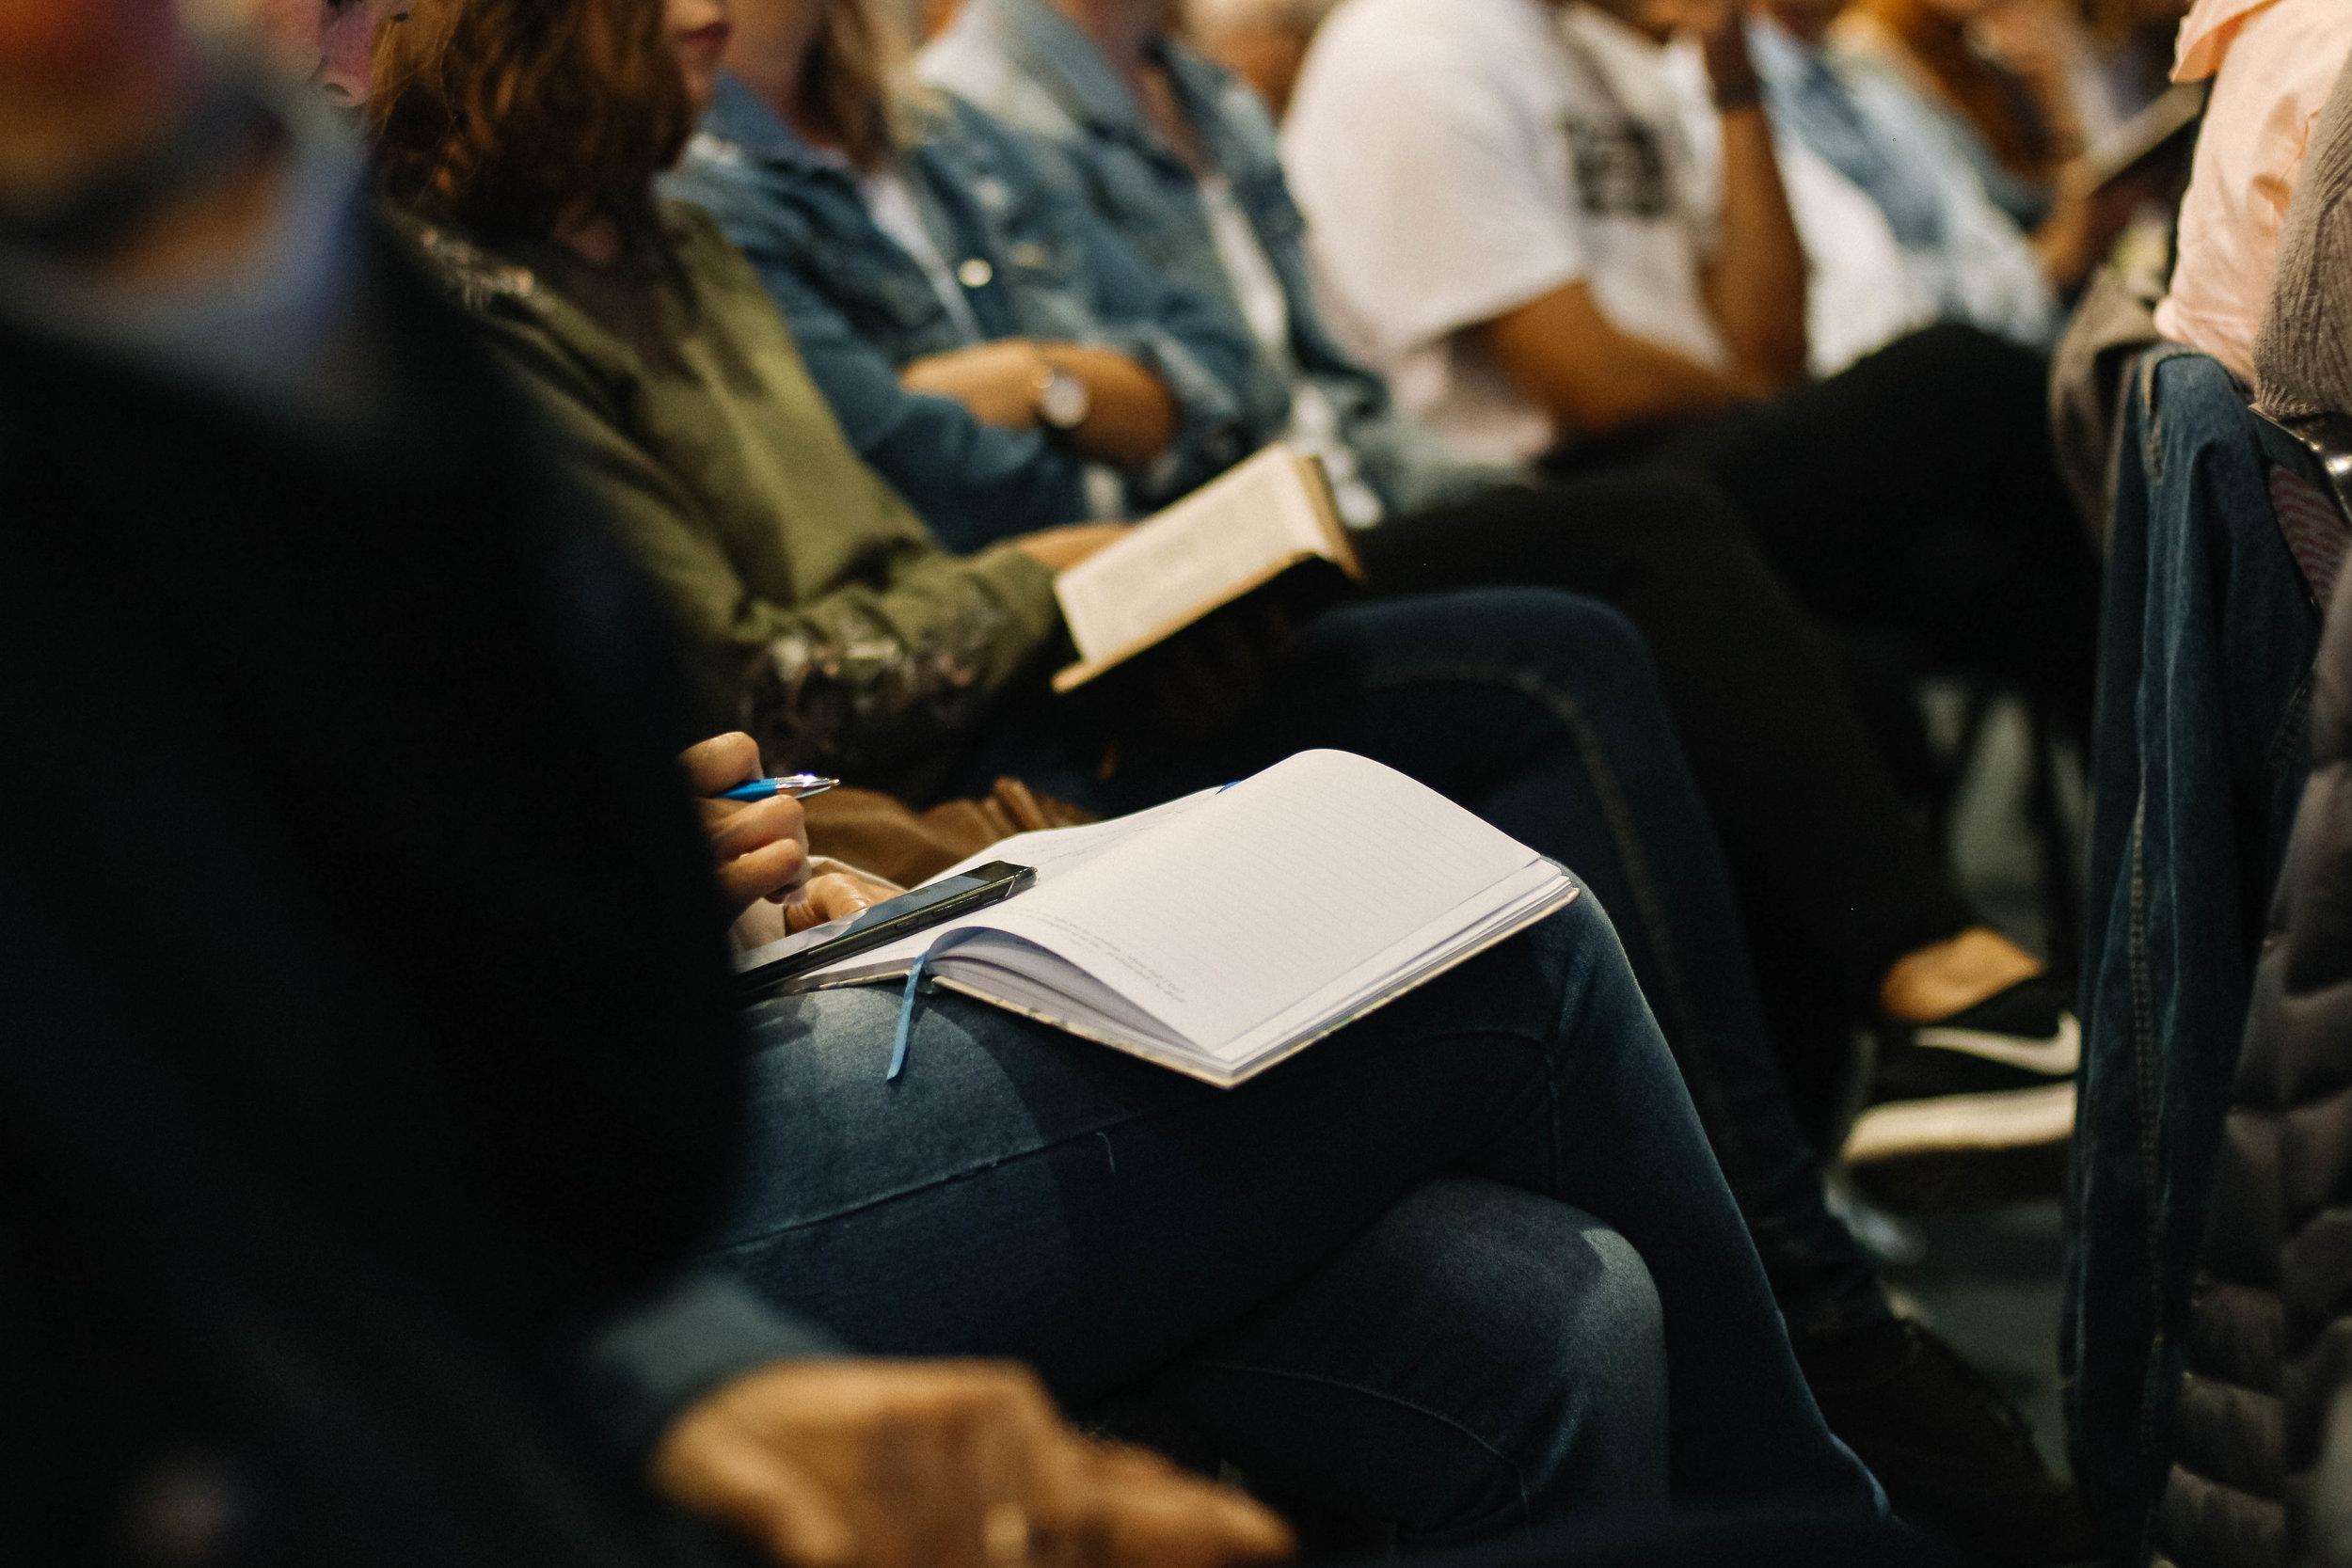 Sunday Service - Corporate worship & teaching